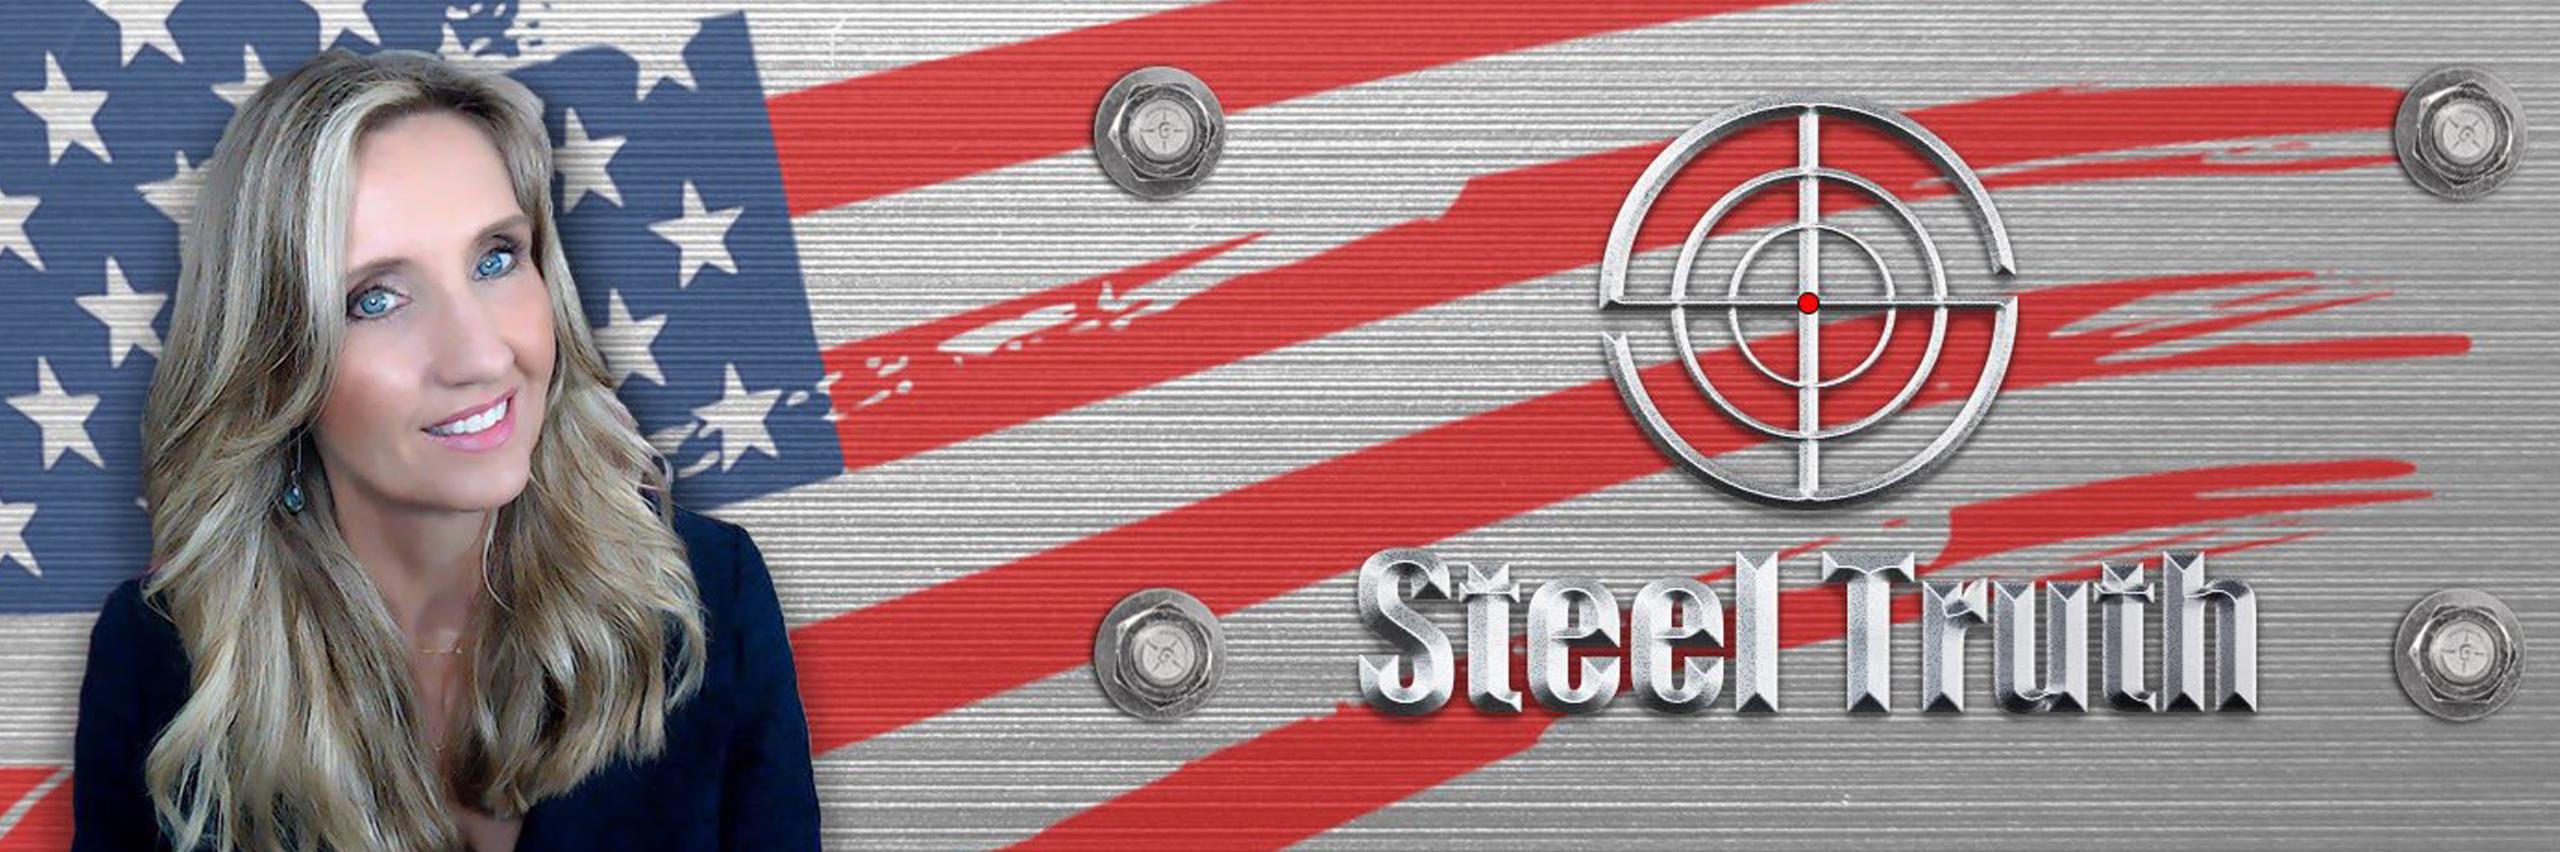 steel_truth-header02